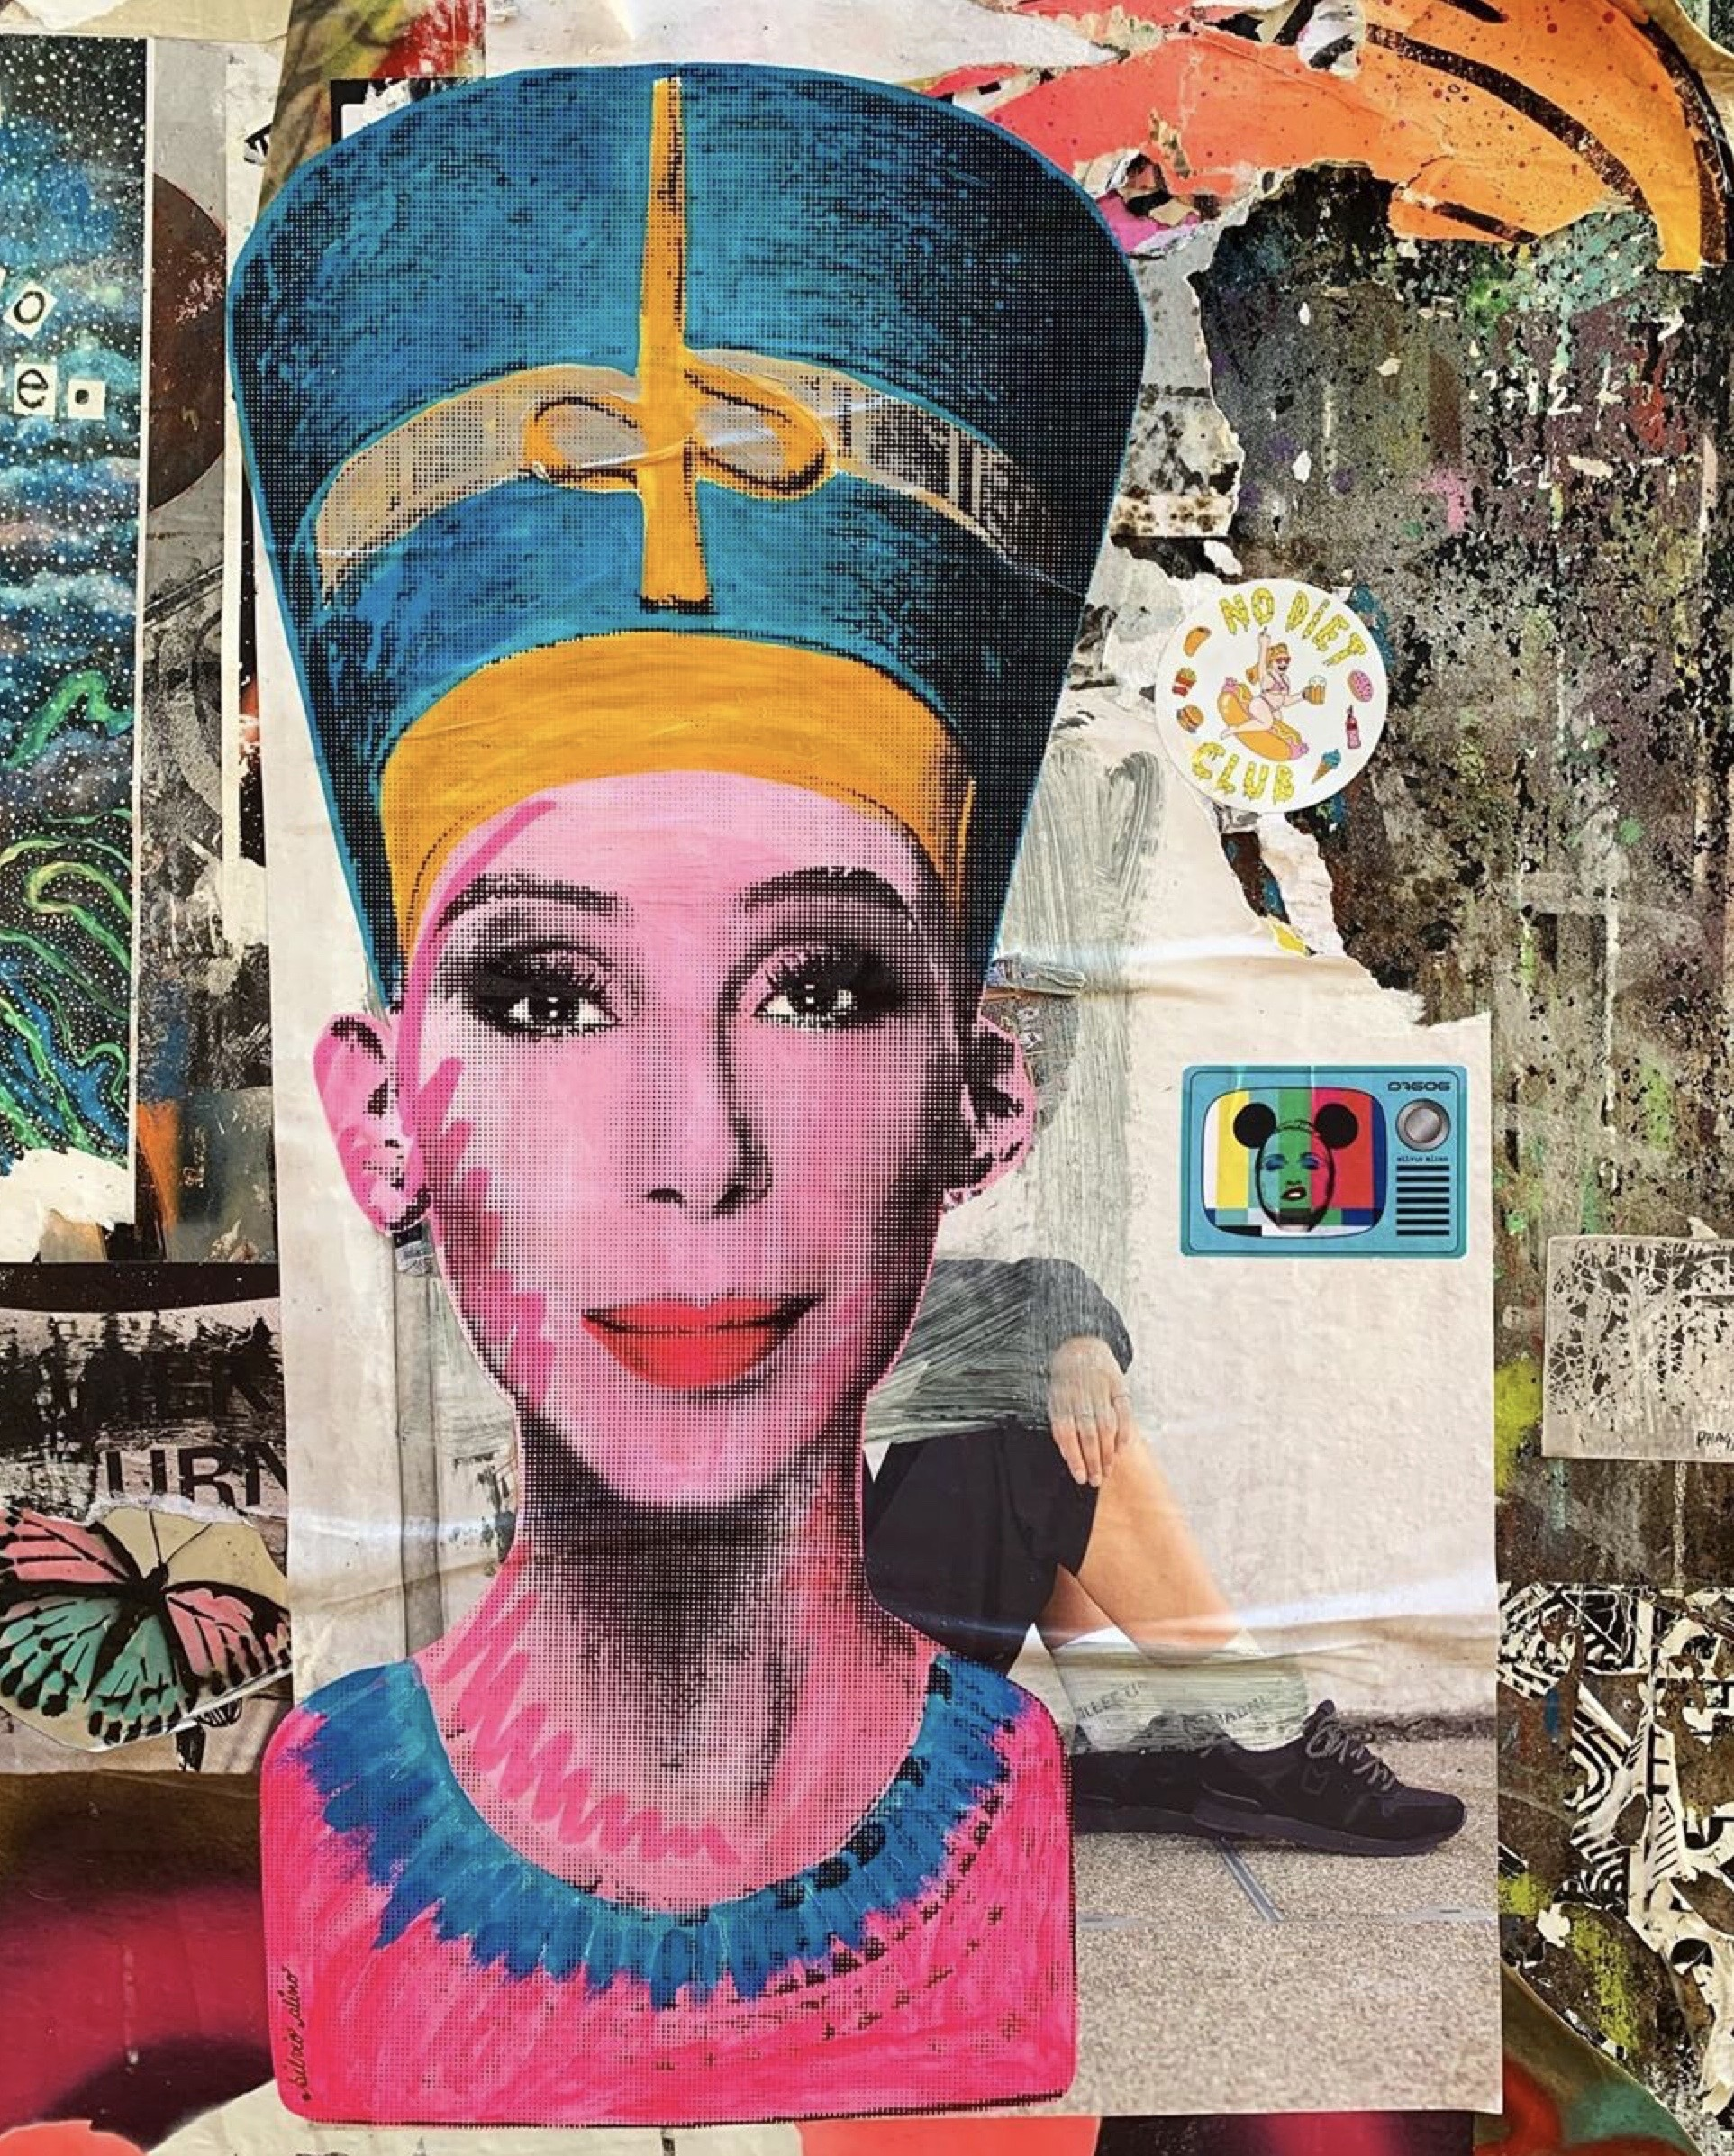 Cher Nefertiti